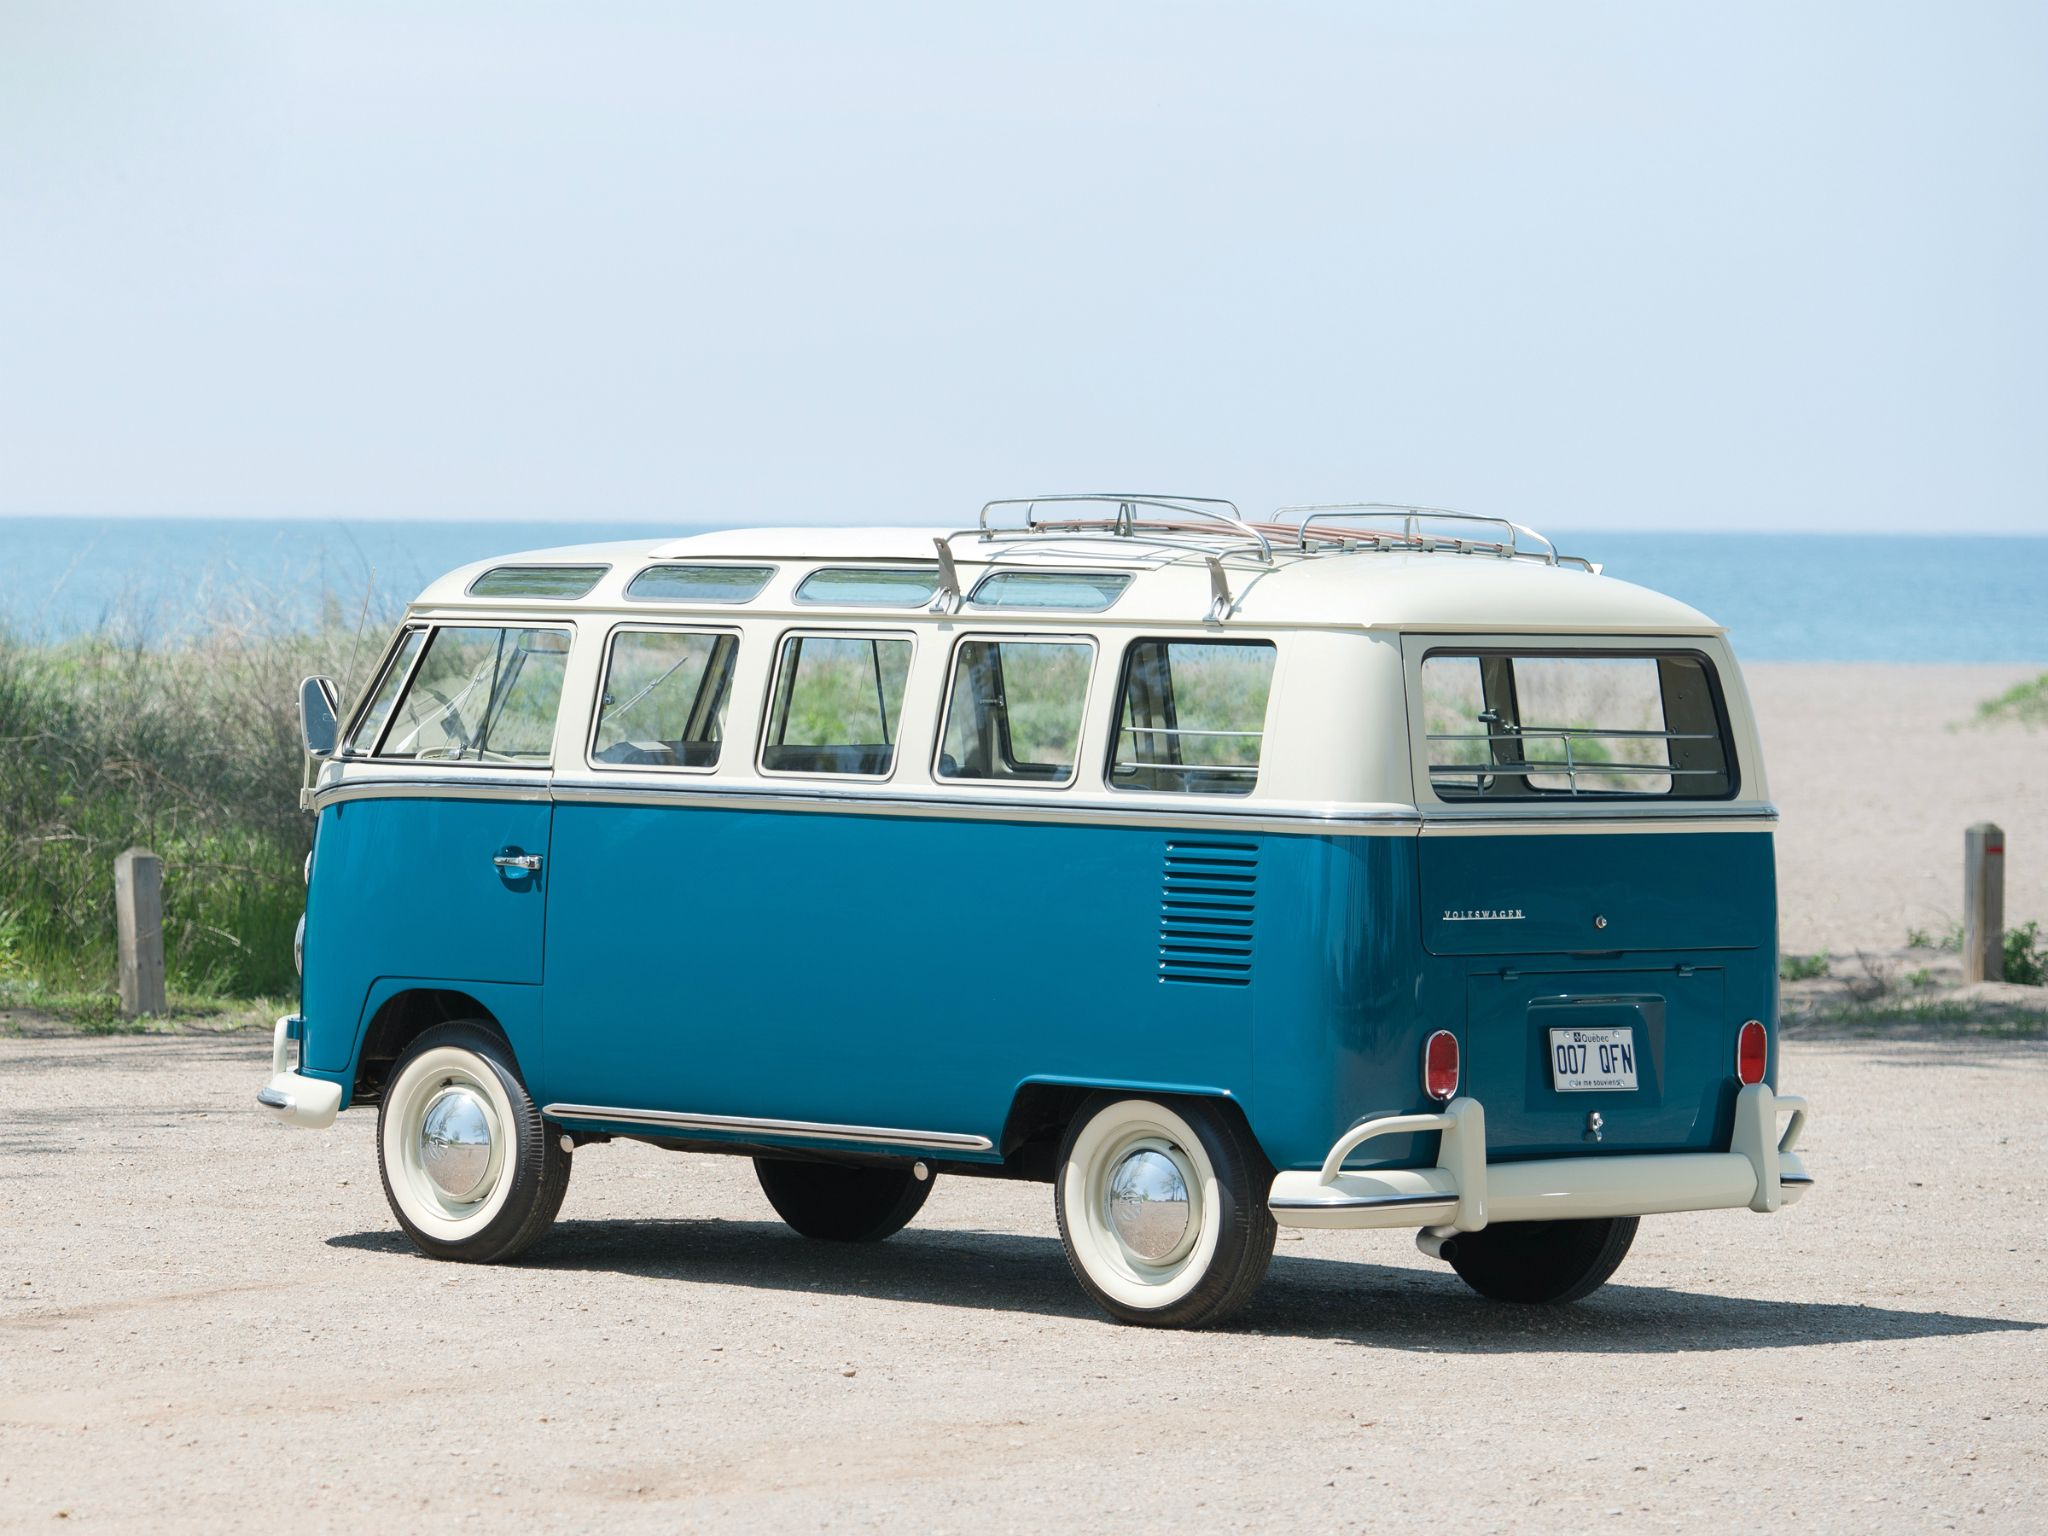 1963 67 Volkswagen T1 Deluxe Samba Bus Vw Bus Oldtimer Classic Vw T1